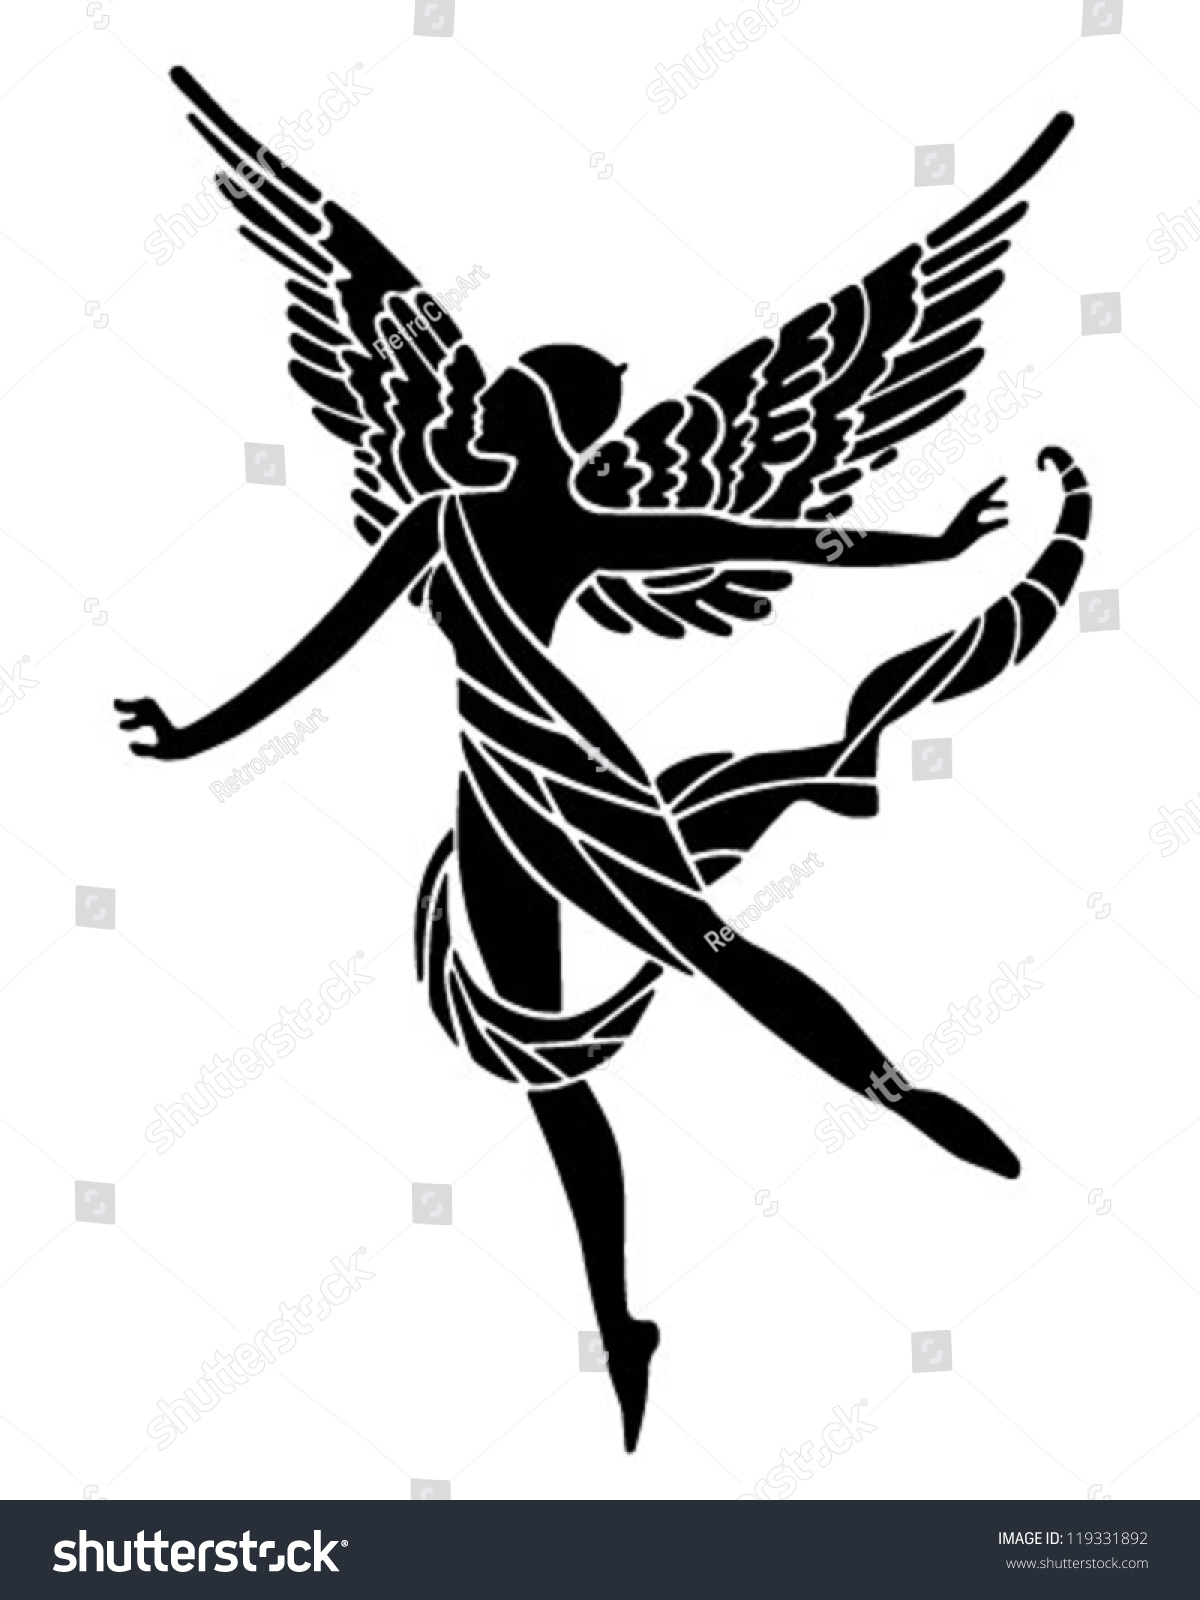 Art Deco Winged Goddess Retro Clipart Stock Vector 119331892 ...